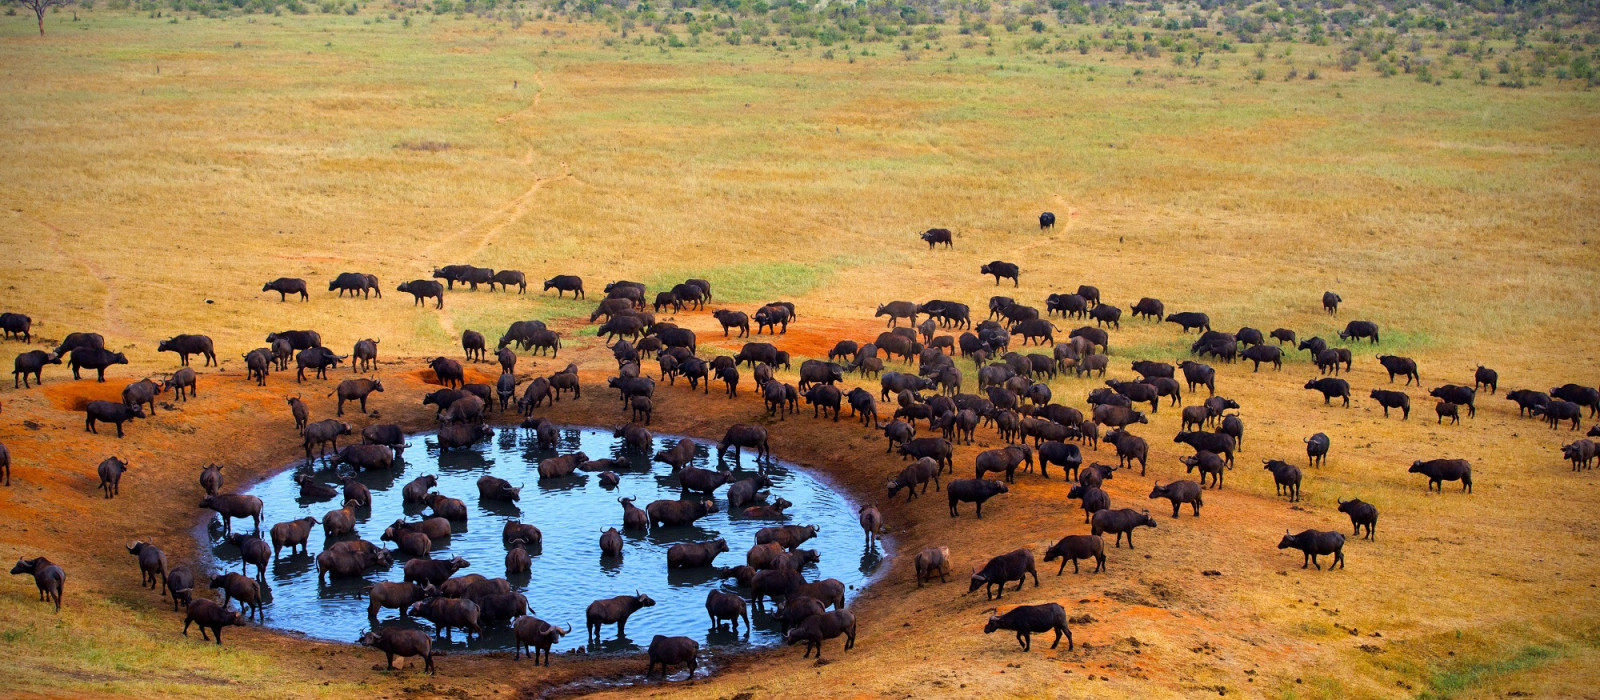 Kenia luxuriös: Wander-Safari, Strand & traumhafte Lodges Urlaub 1